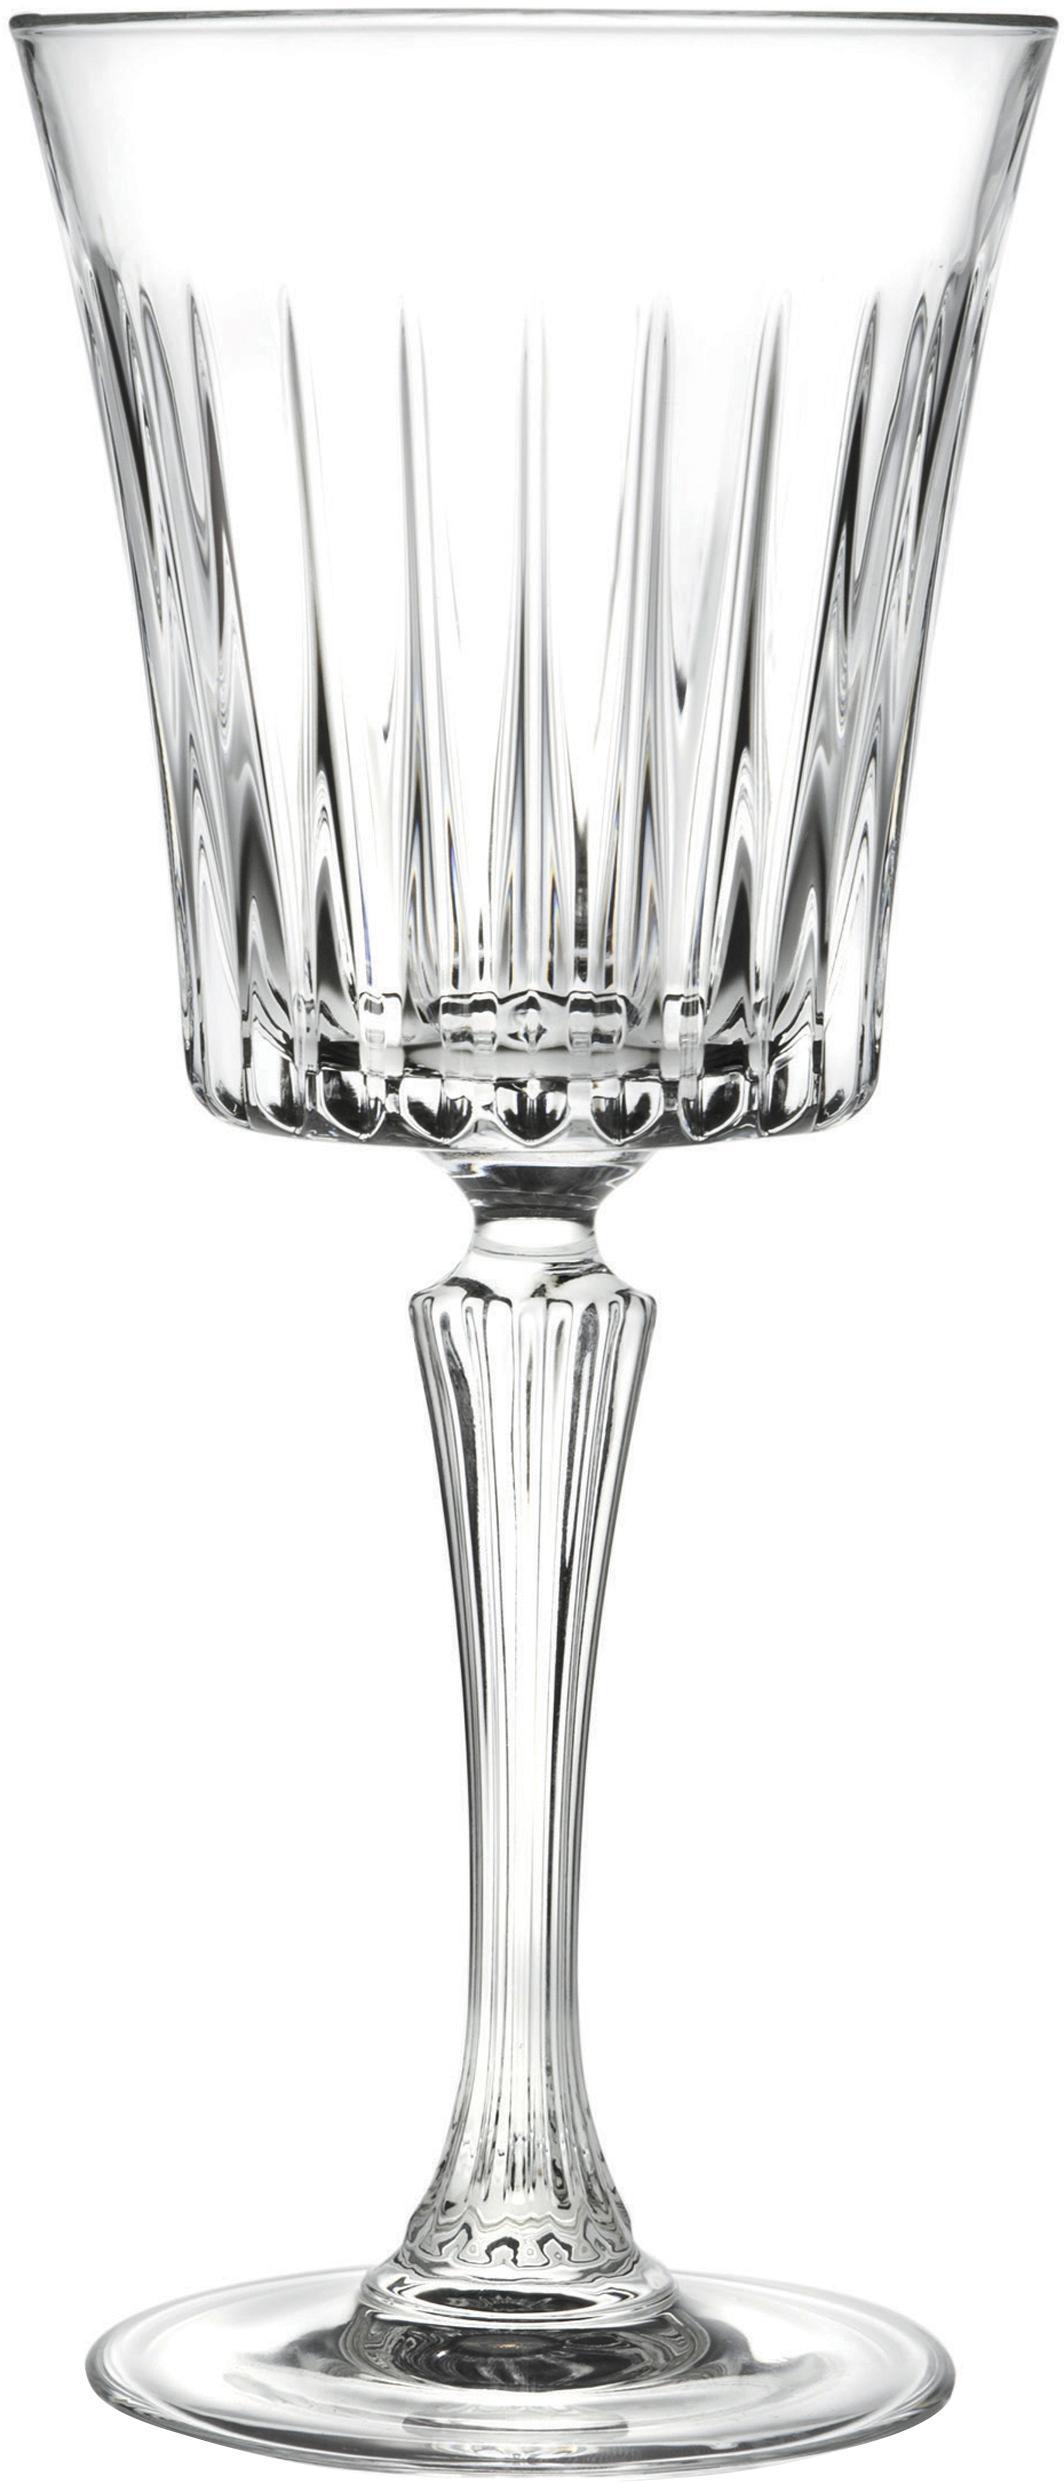 Kristall-Rotweingläser Timeless mit Rillenstruktur, 6er-Set, Kristallglas, Transparent, Ø 9 x H 21 cm